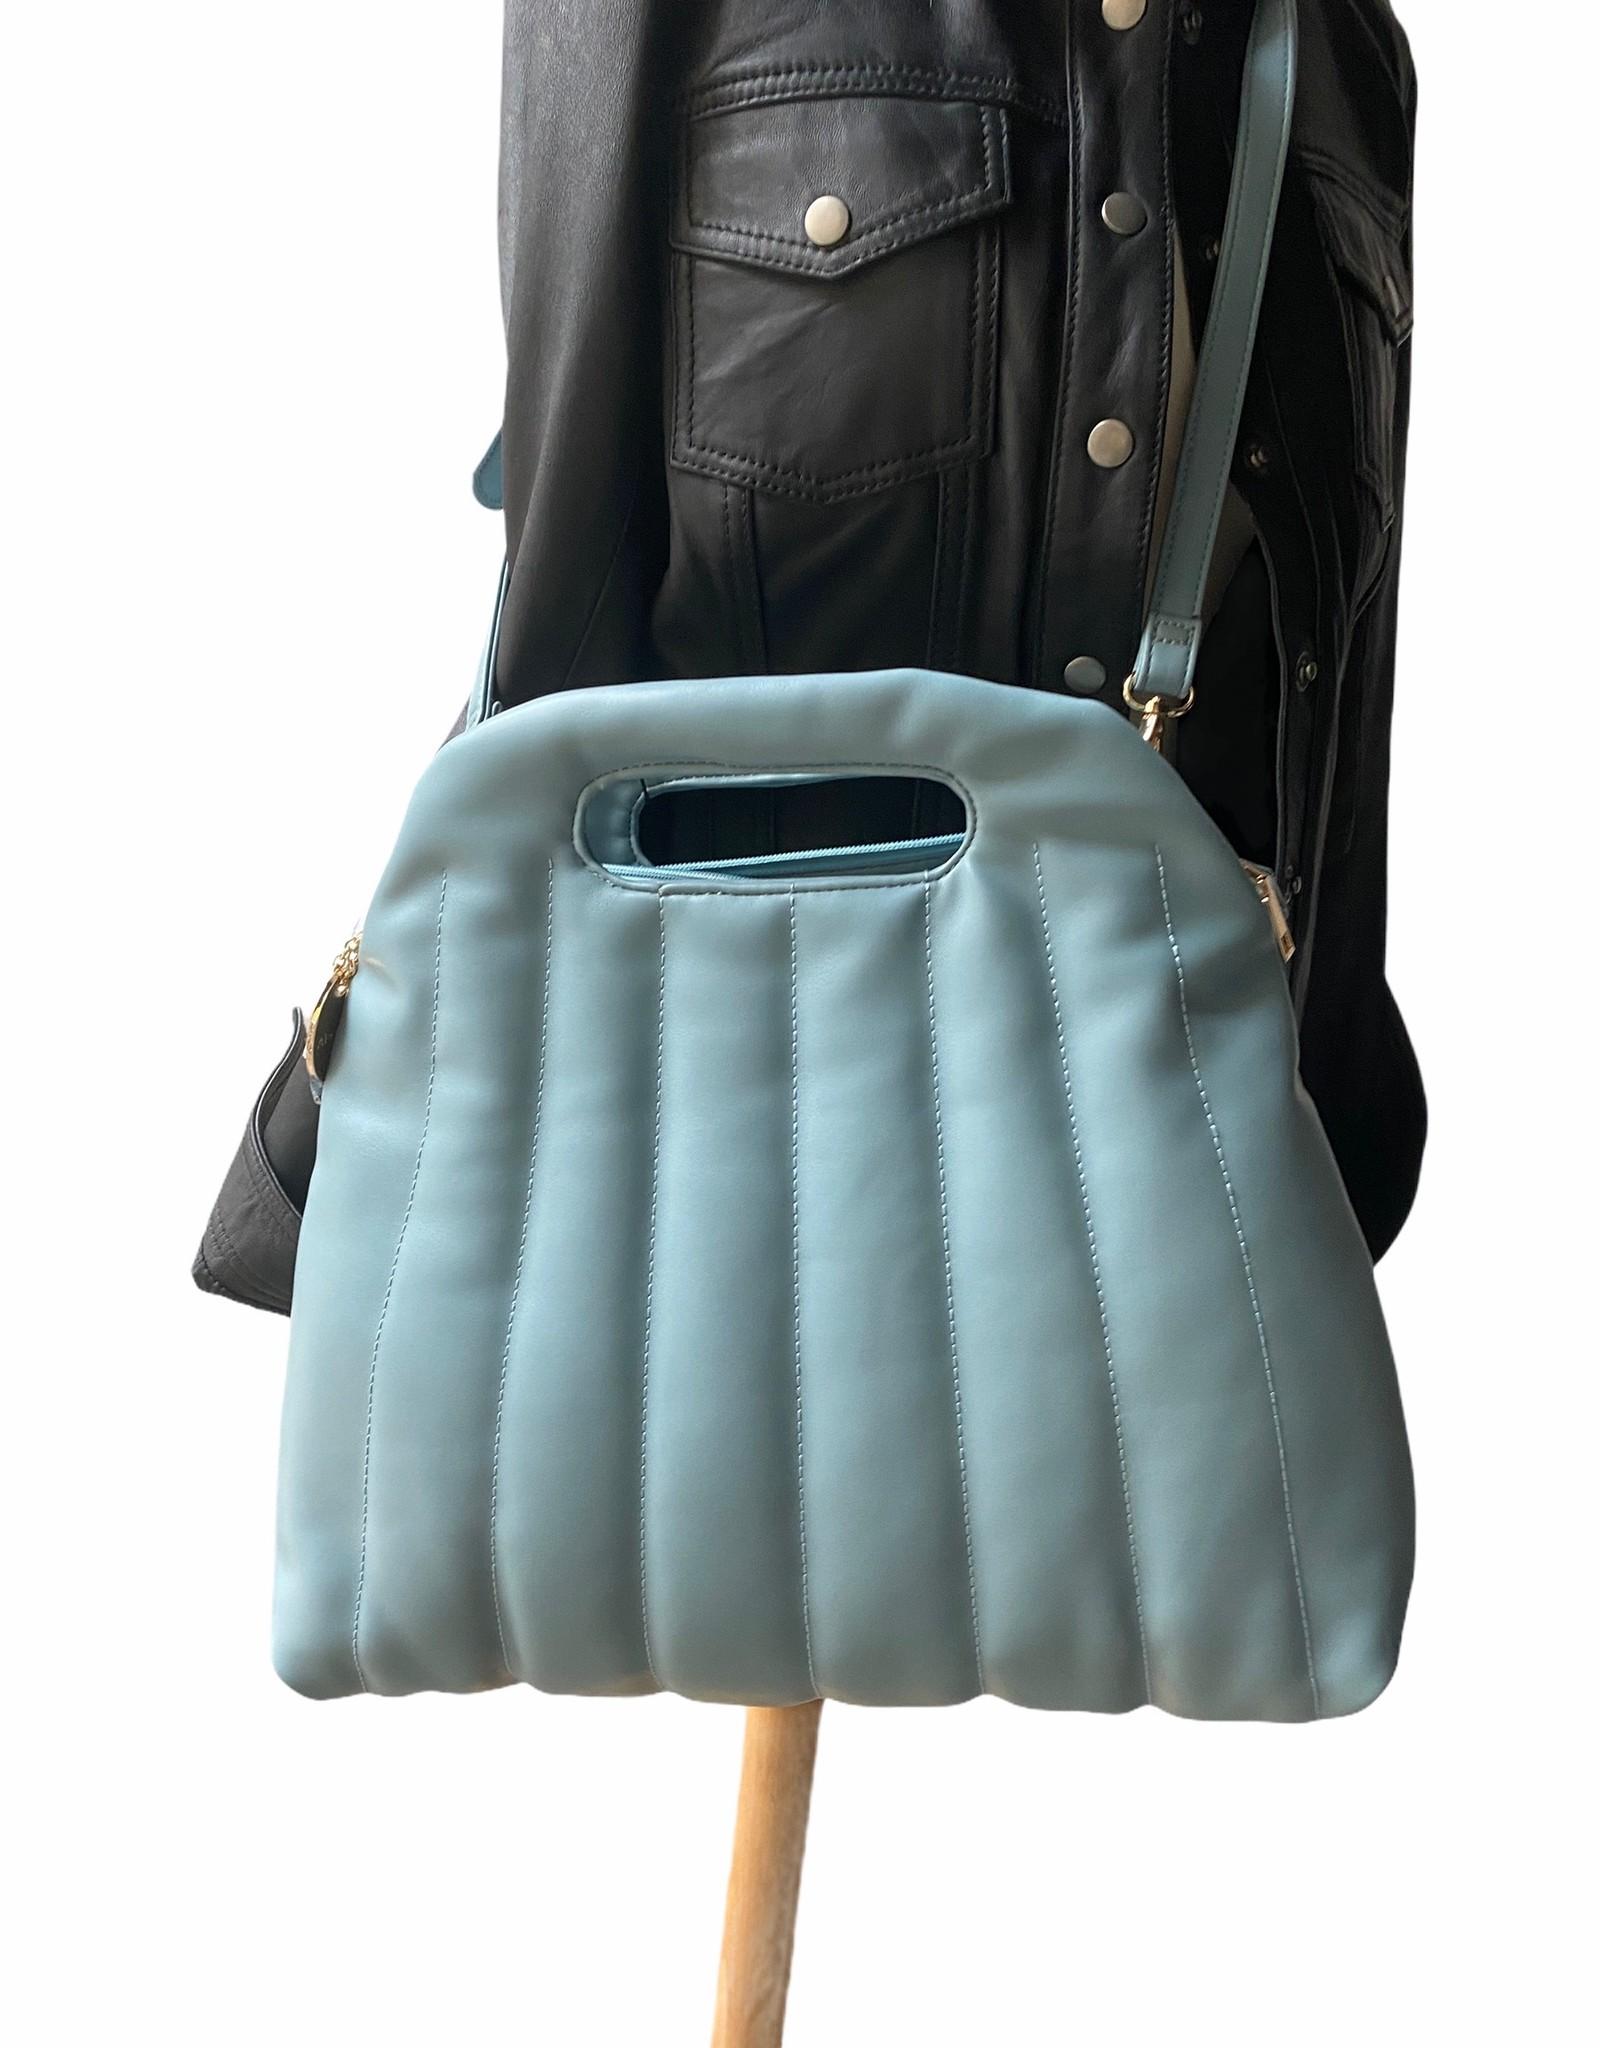 Artificial leather handbag with long shoulderbelt.